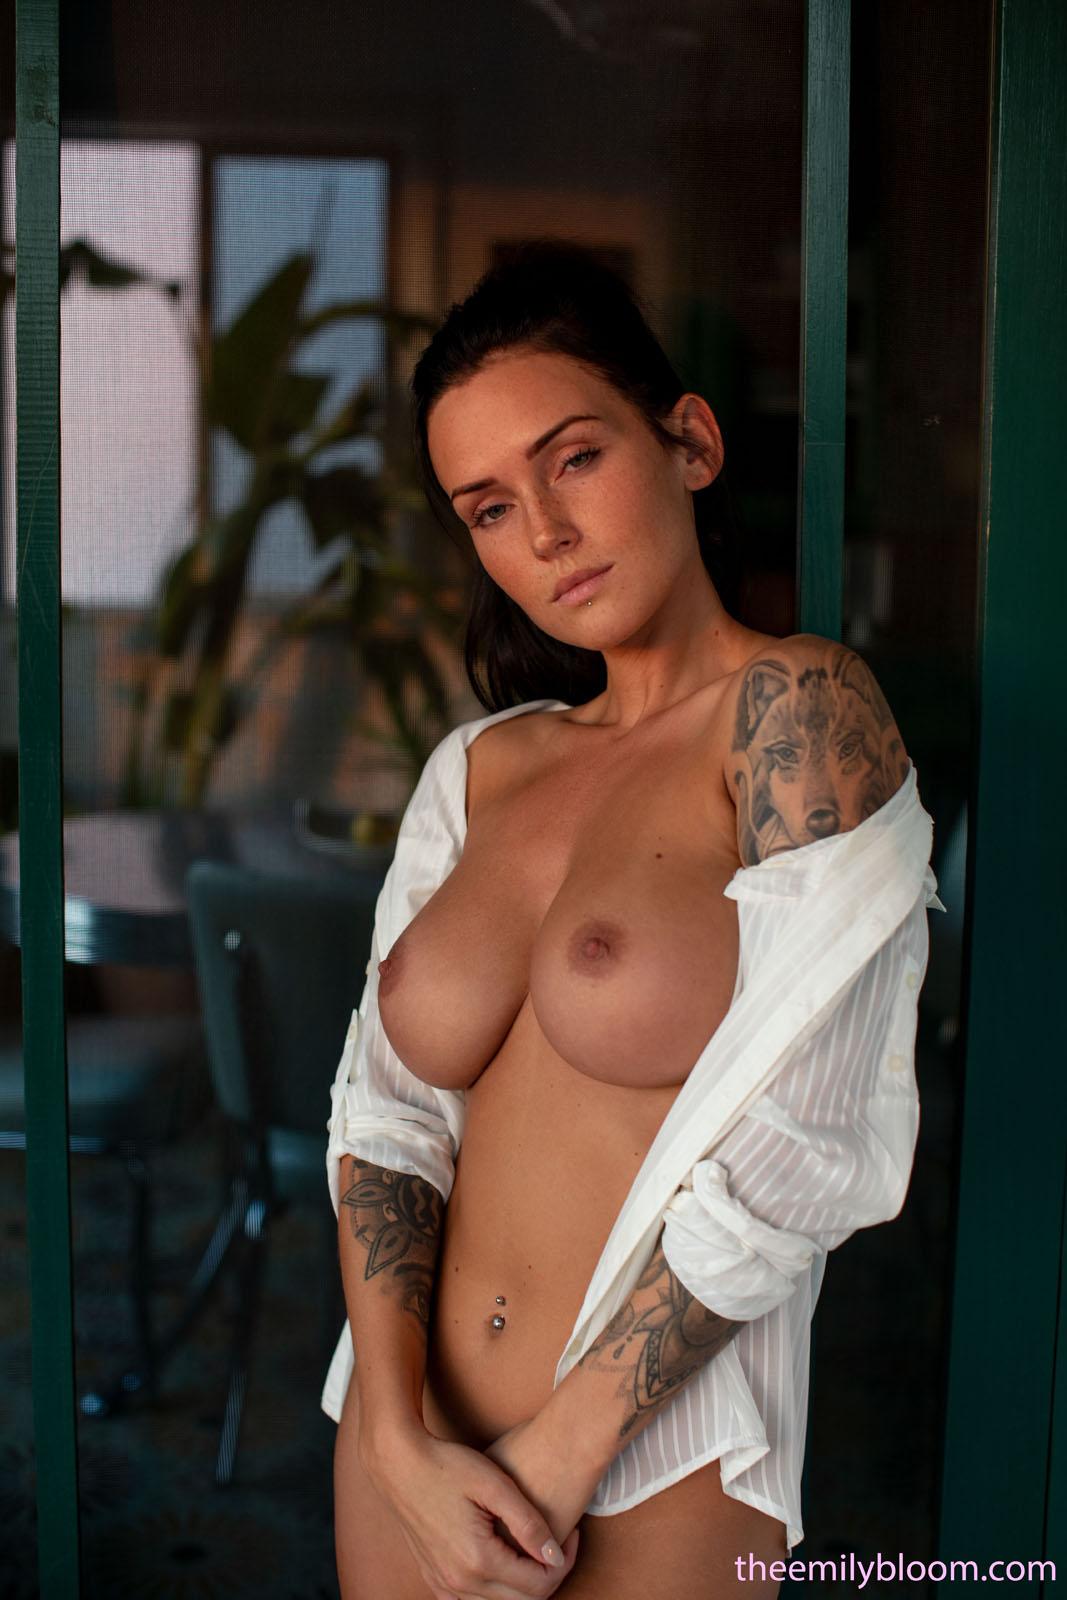 Kayla Until Dusk Emily Bloom nude pics  Bunnylustcom